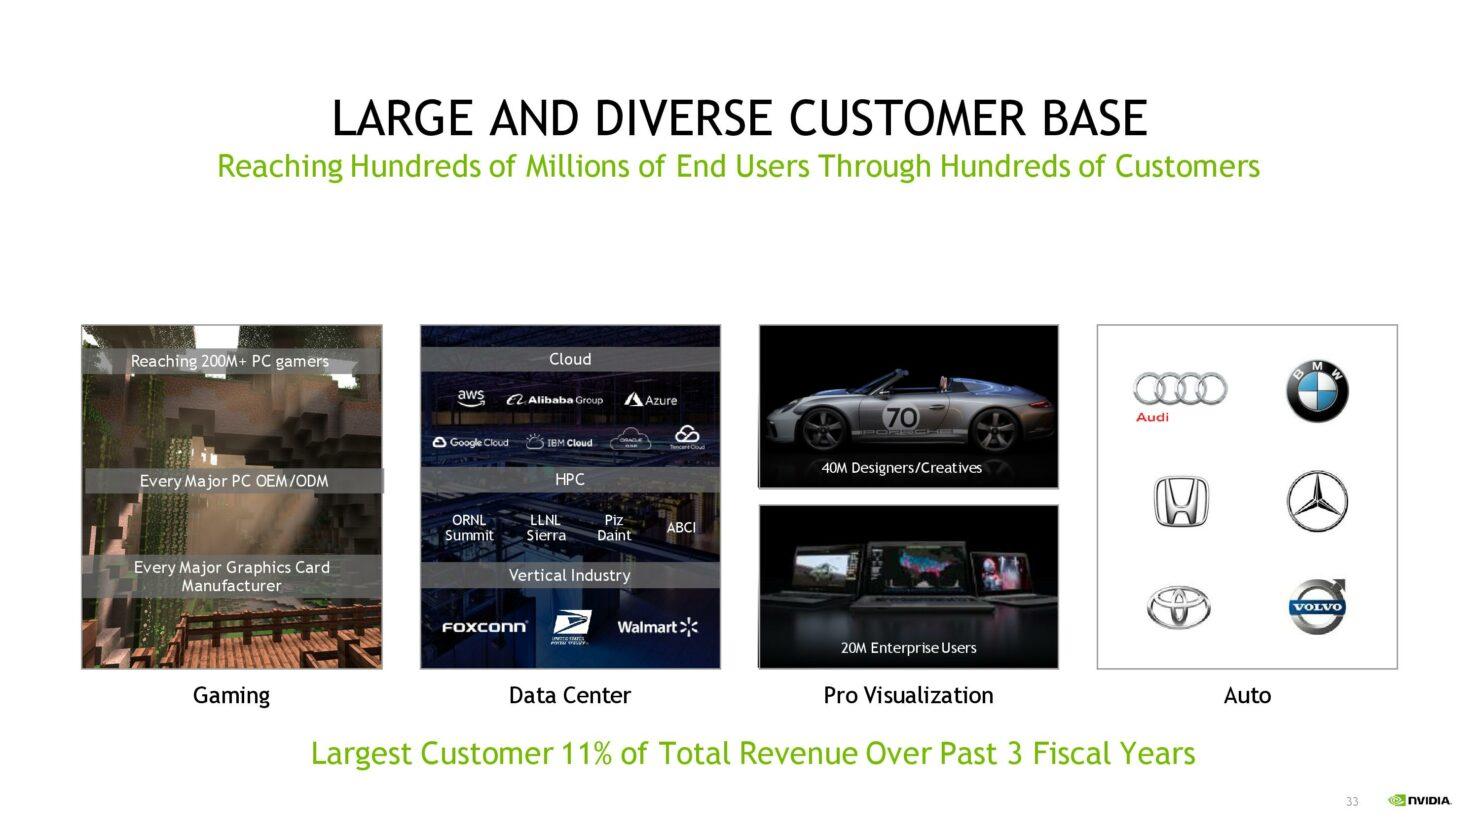 nvda-1qfy21-investor-presentation-5-21-20-final-page-033